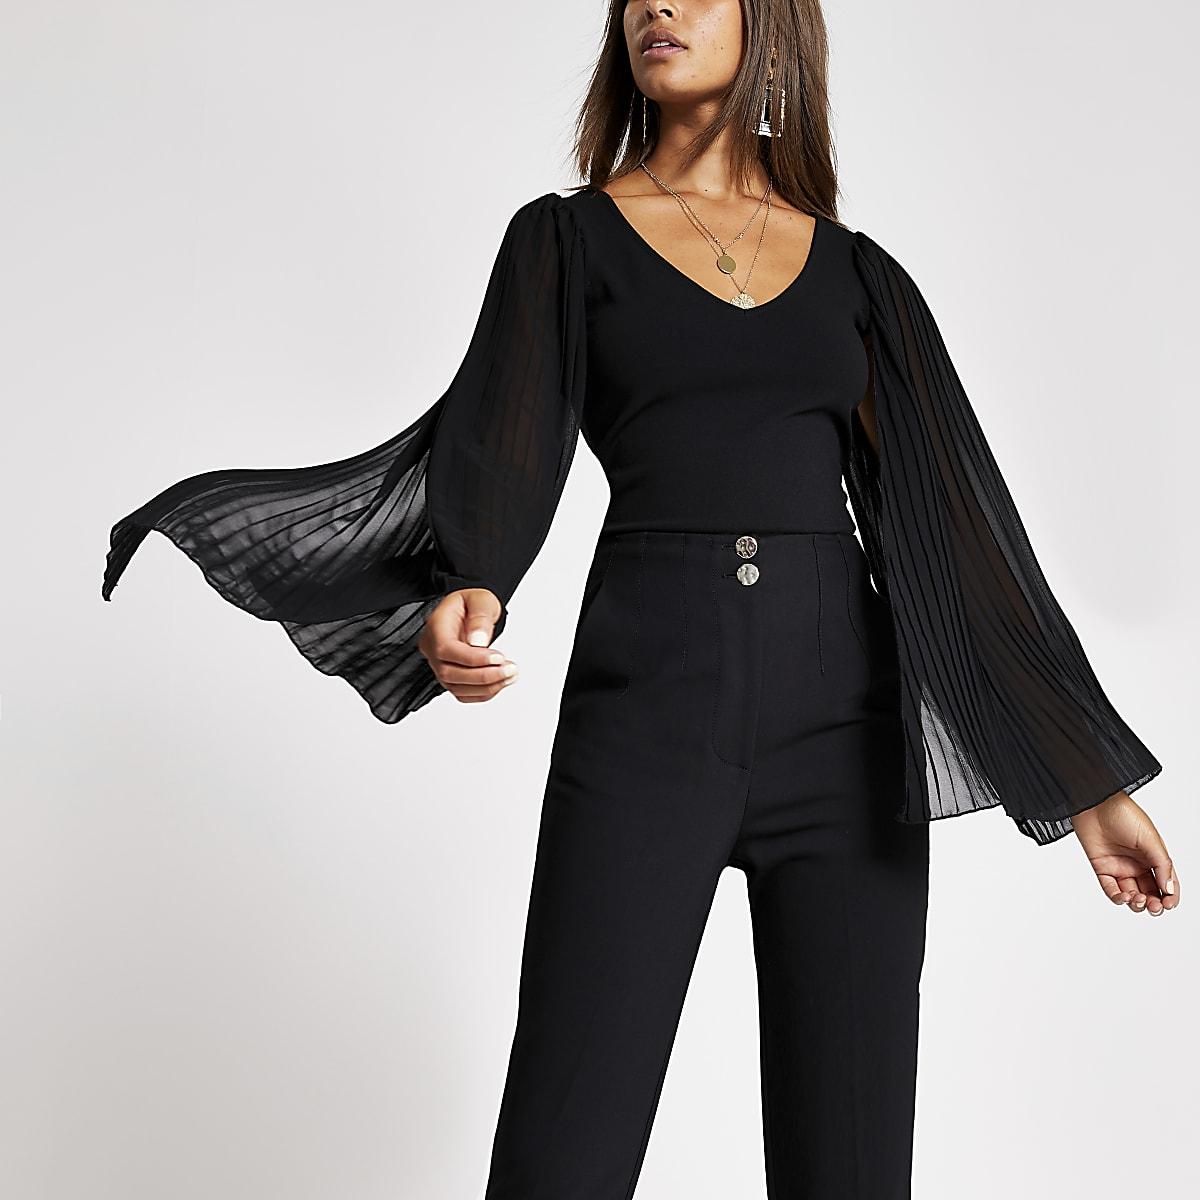 Black long sheer pleated sleeve V neck top